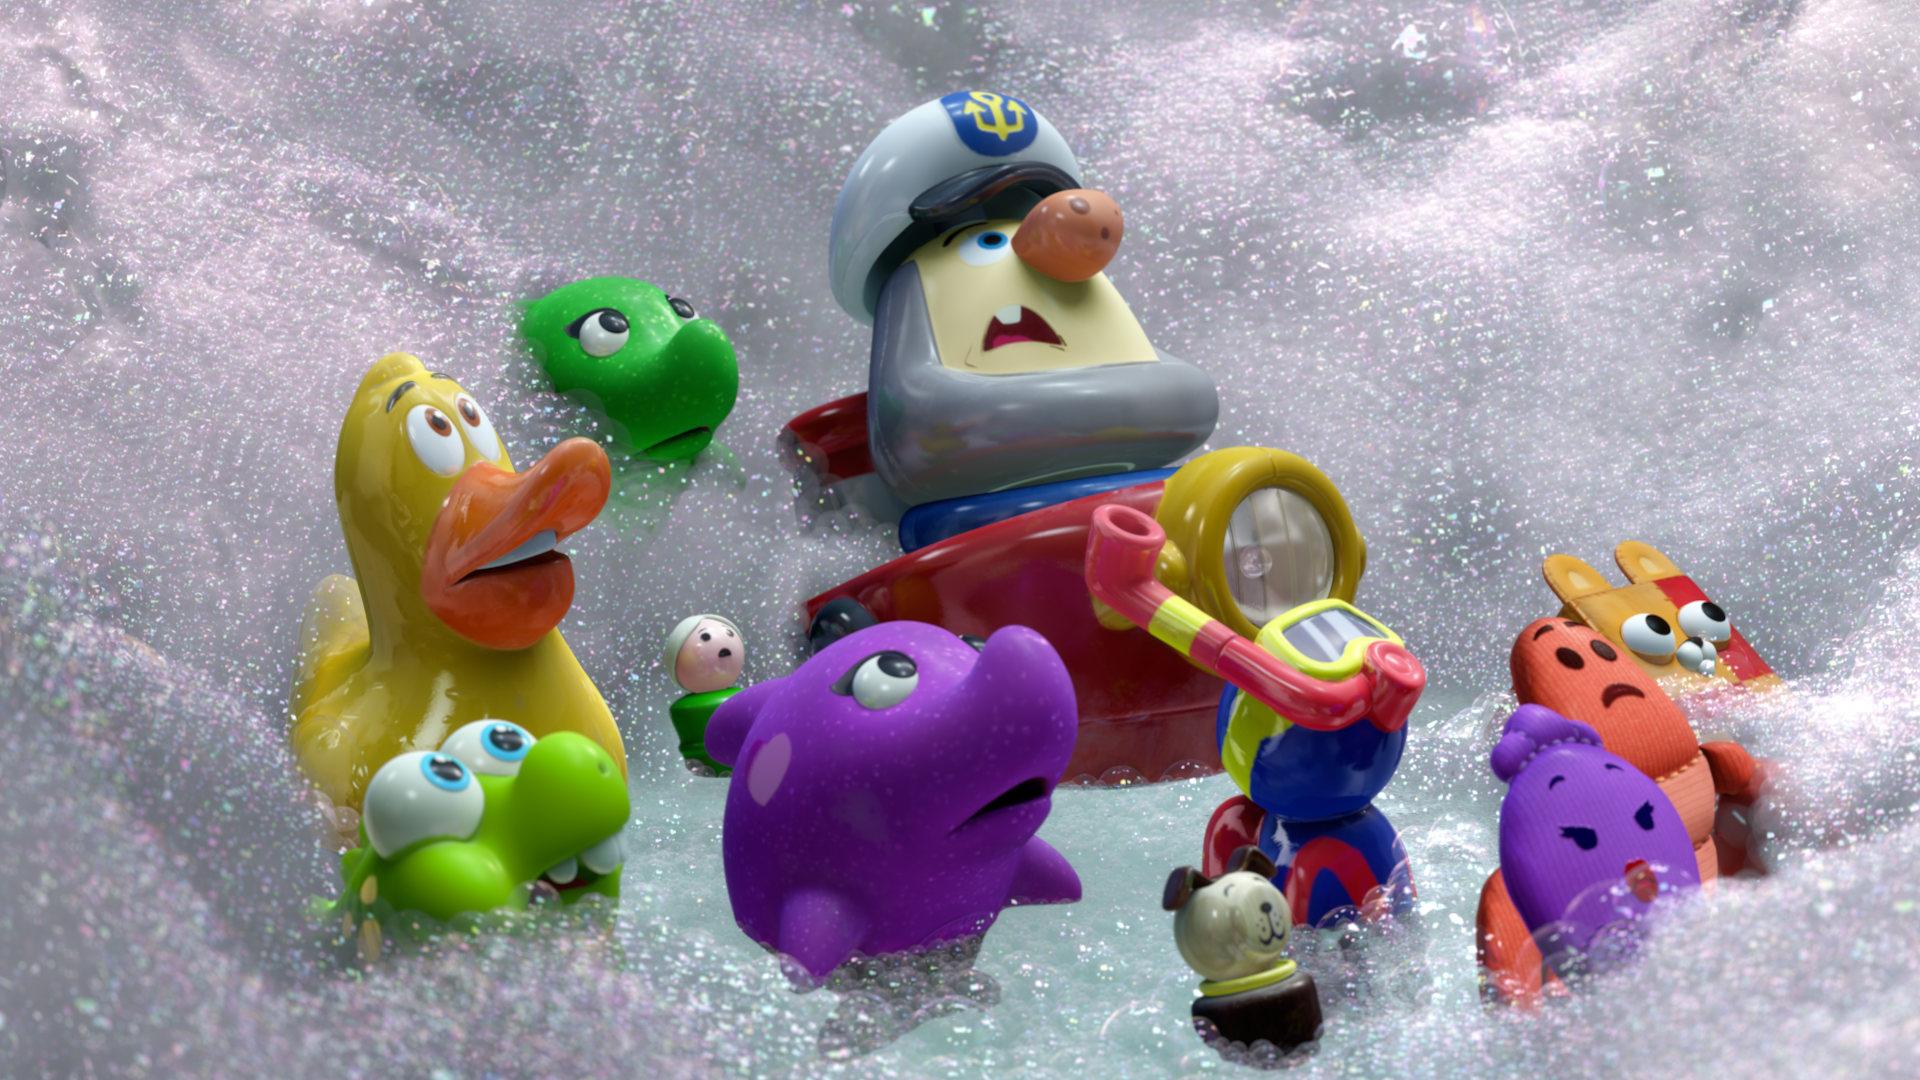 Pixar planet disney toy story toons partysaurus rex